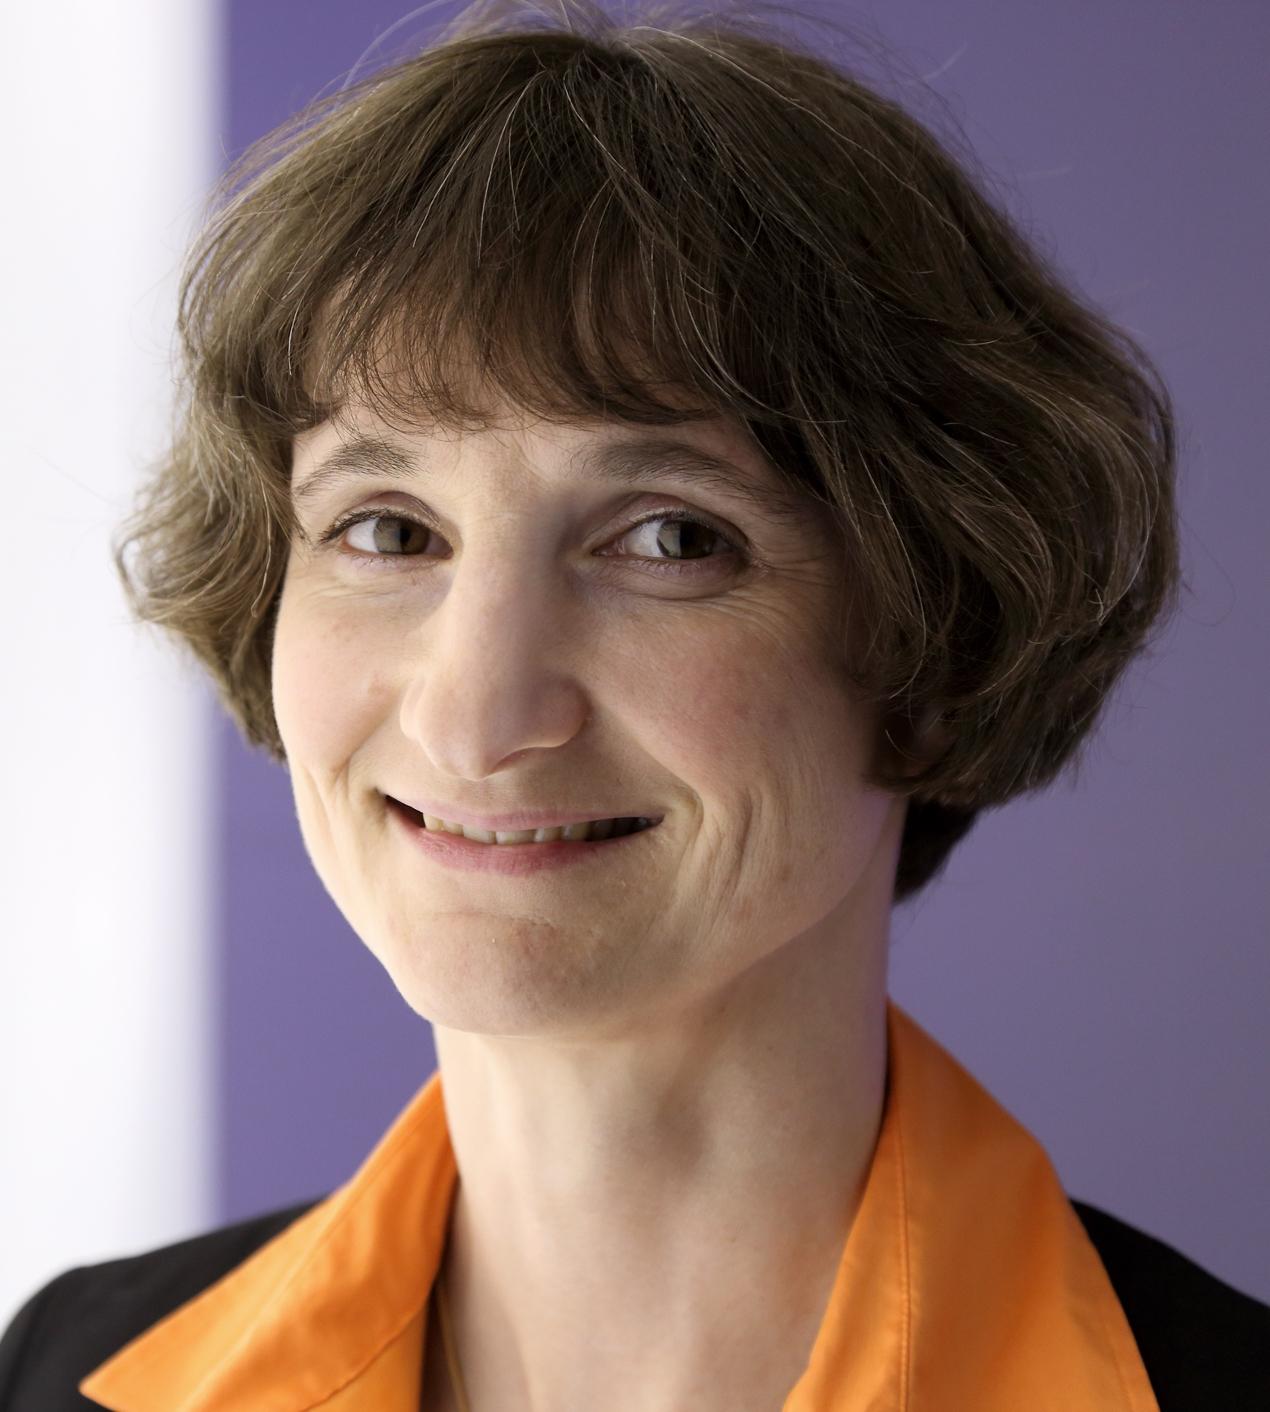 Dr. Heike Riel